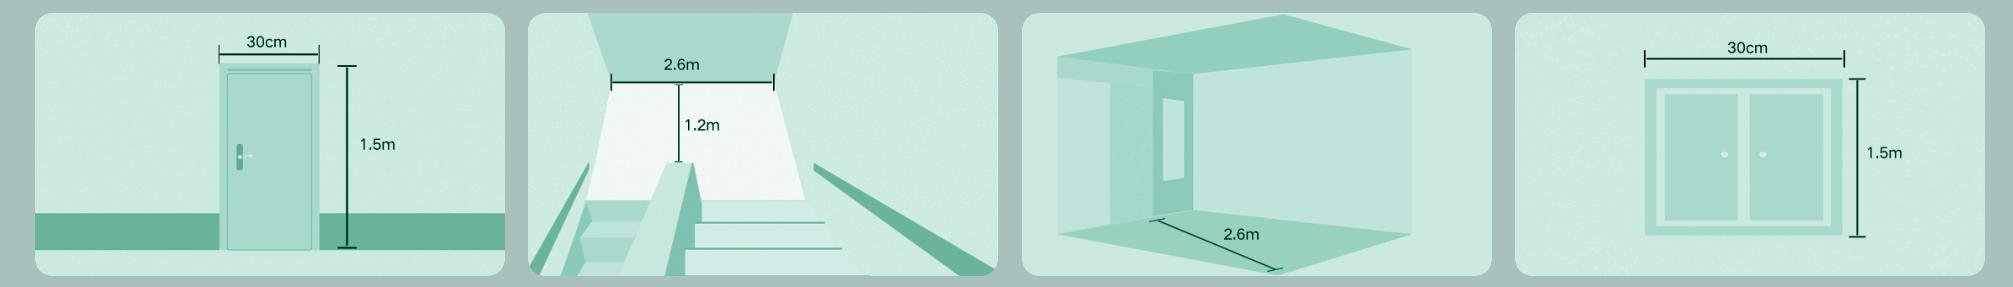 Zoll Diagonale